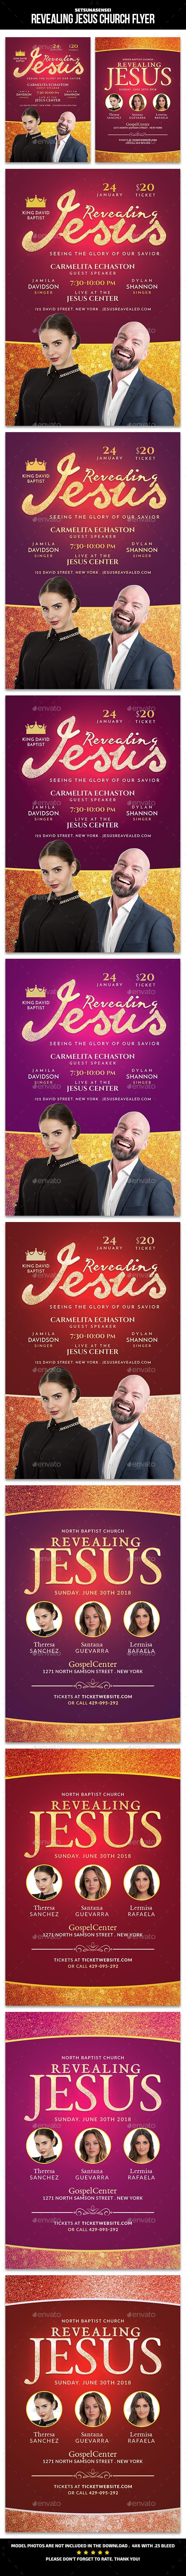 Revealing Jesus Church Flyer - Church Flyers